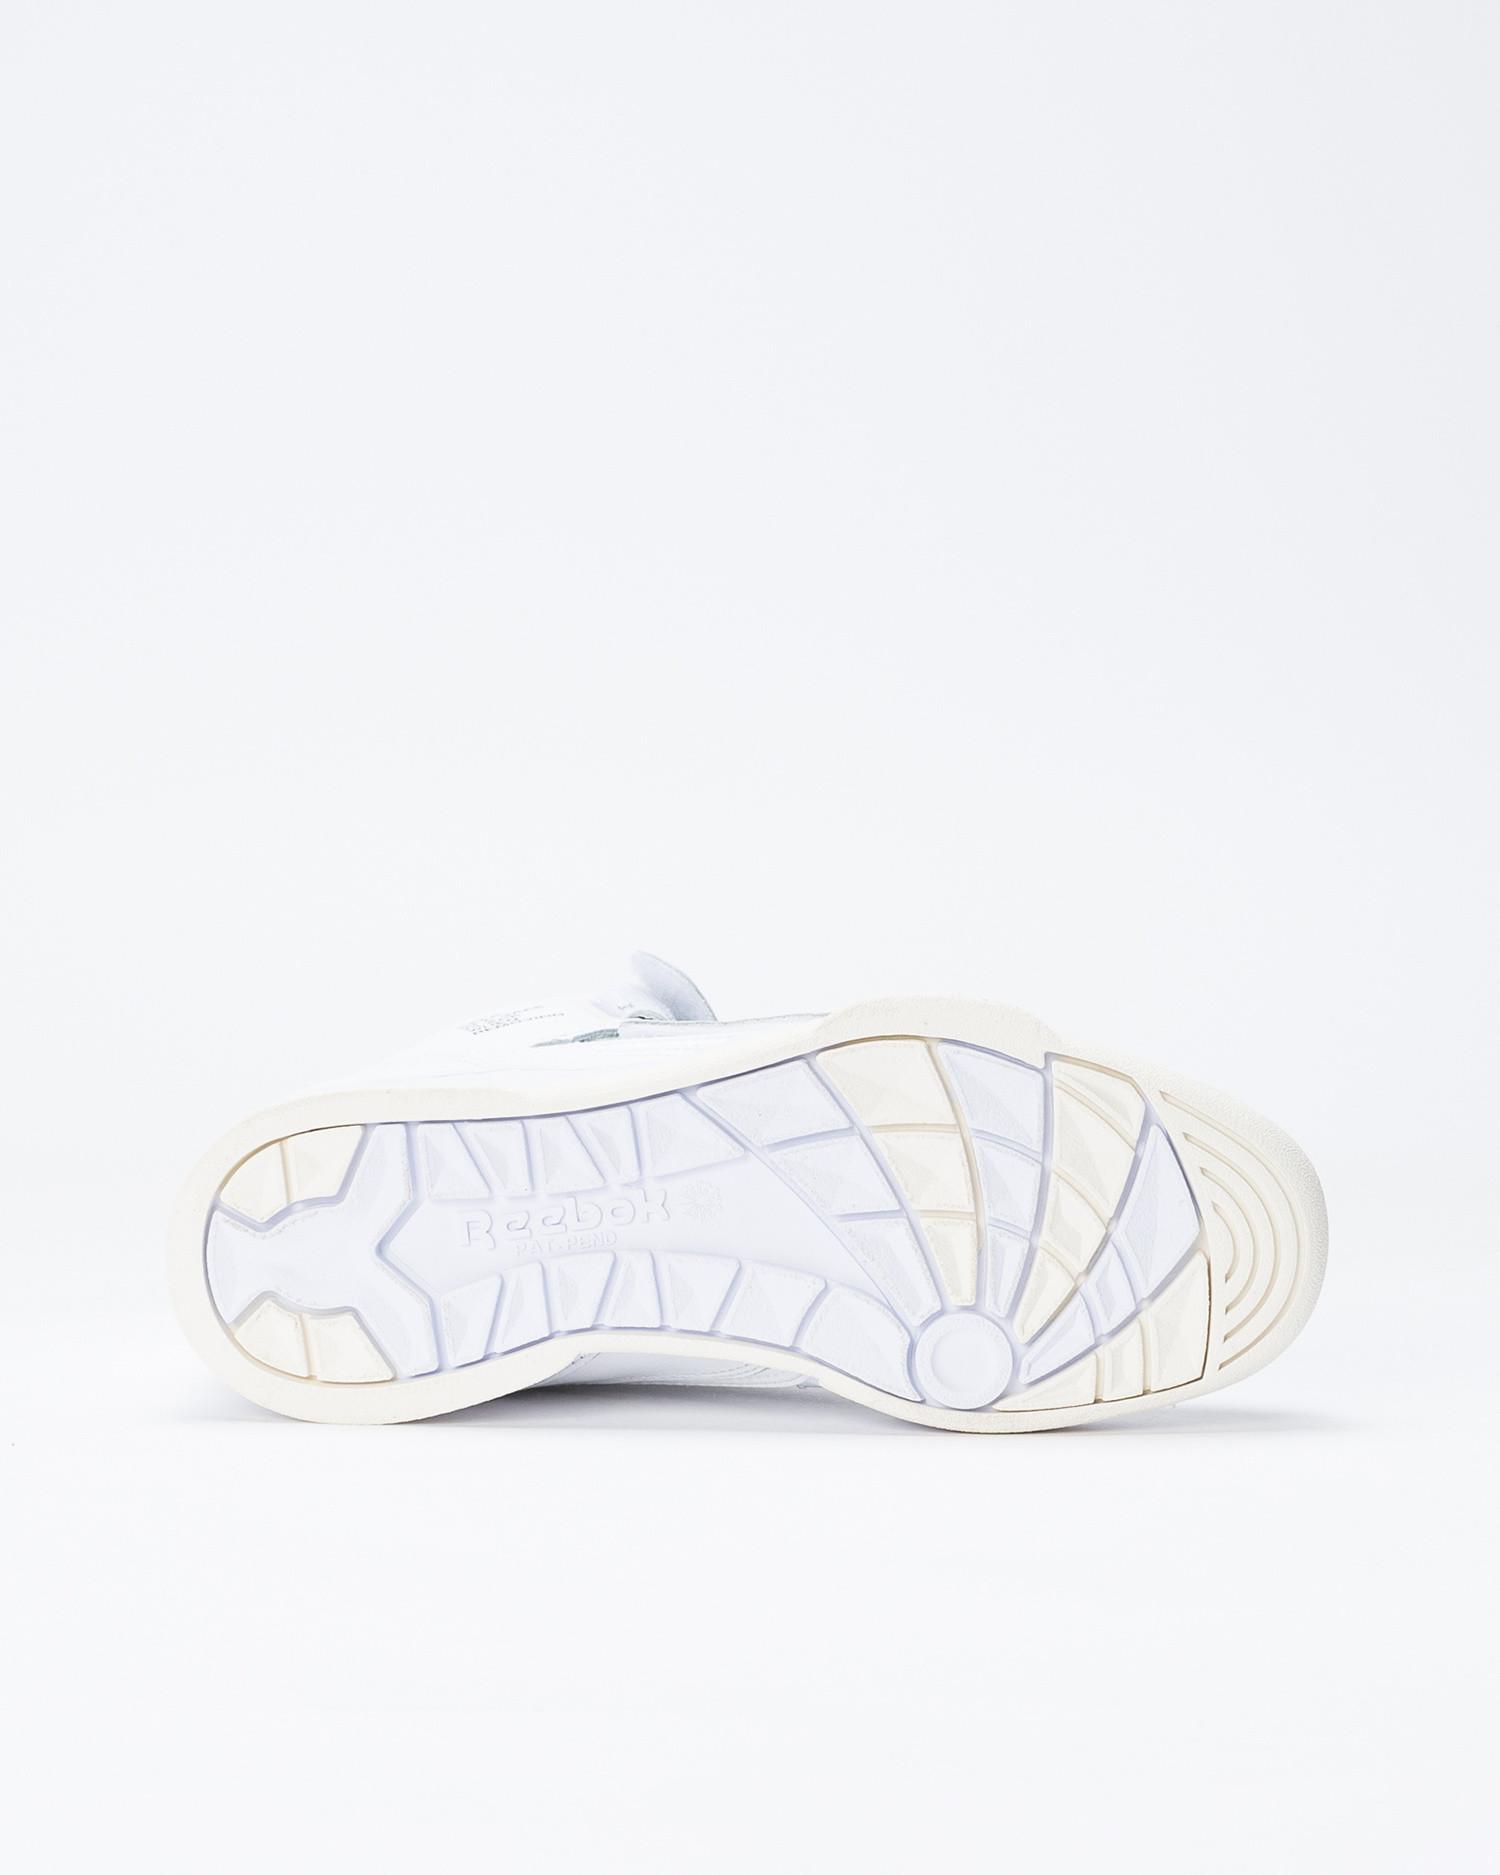 Reebok Alien Stomper MR White/Black/Porcel